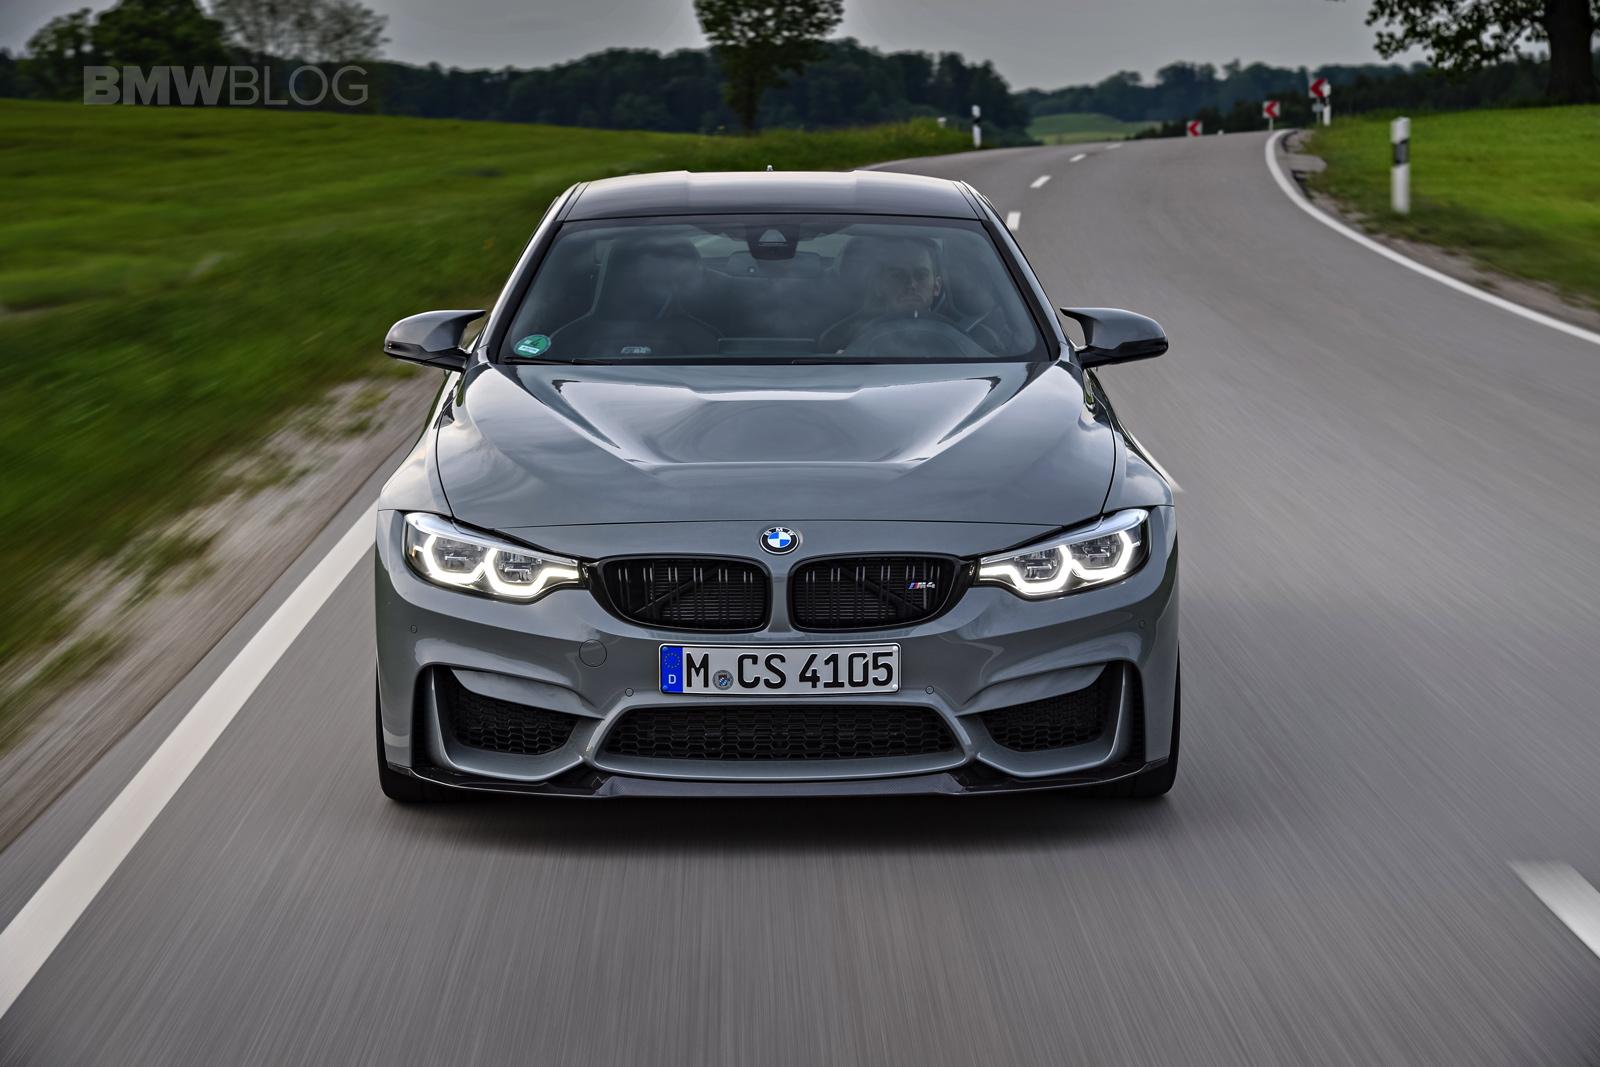 BMW M4 CS LIME ROCK GREY 50